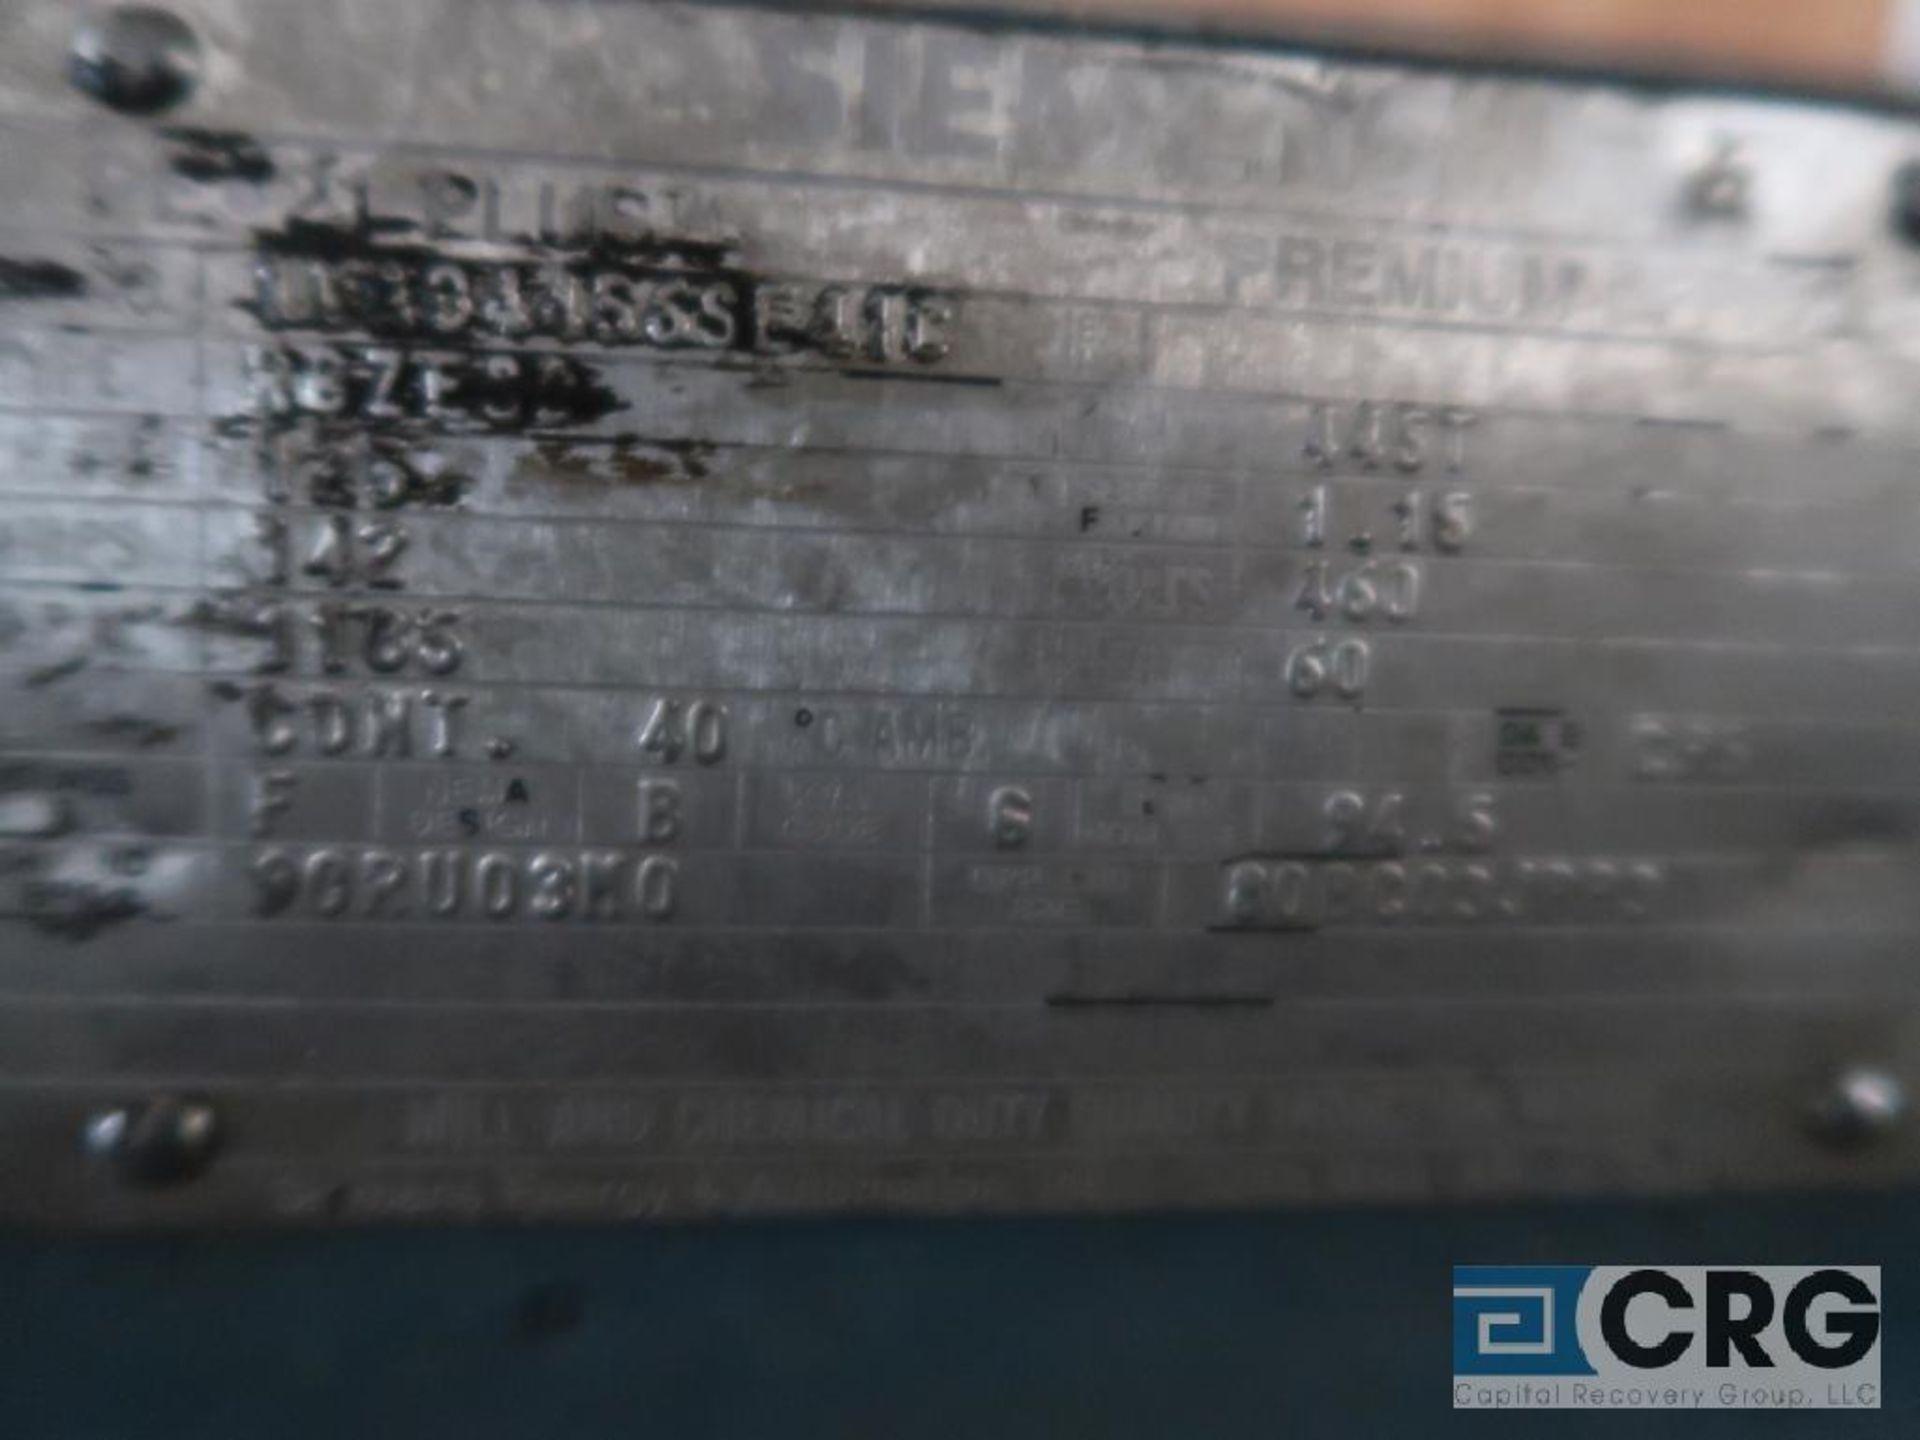 Siemens 125 HP motor, 460 volt, 3 ph., 1,185 RPM, frame 445T (Off Site Warehouse) - Image 2 of 2